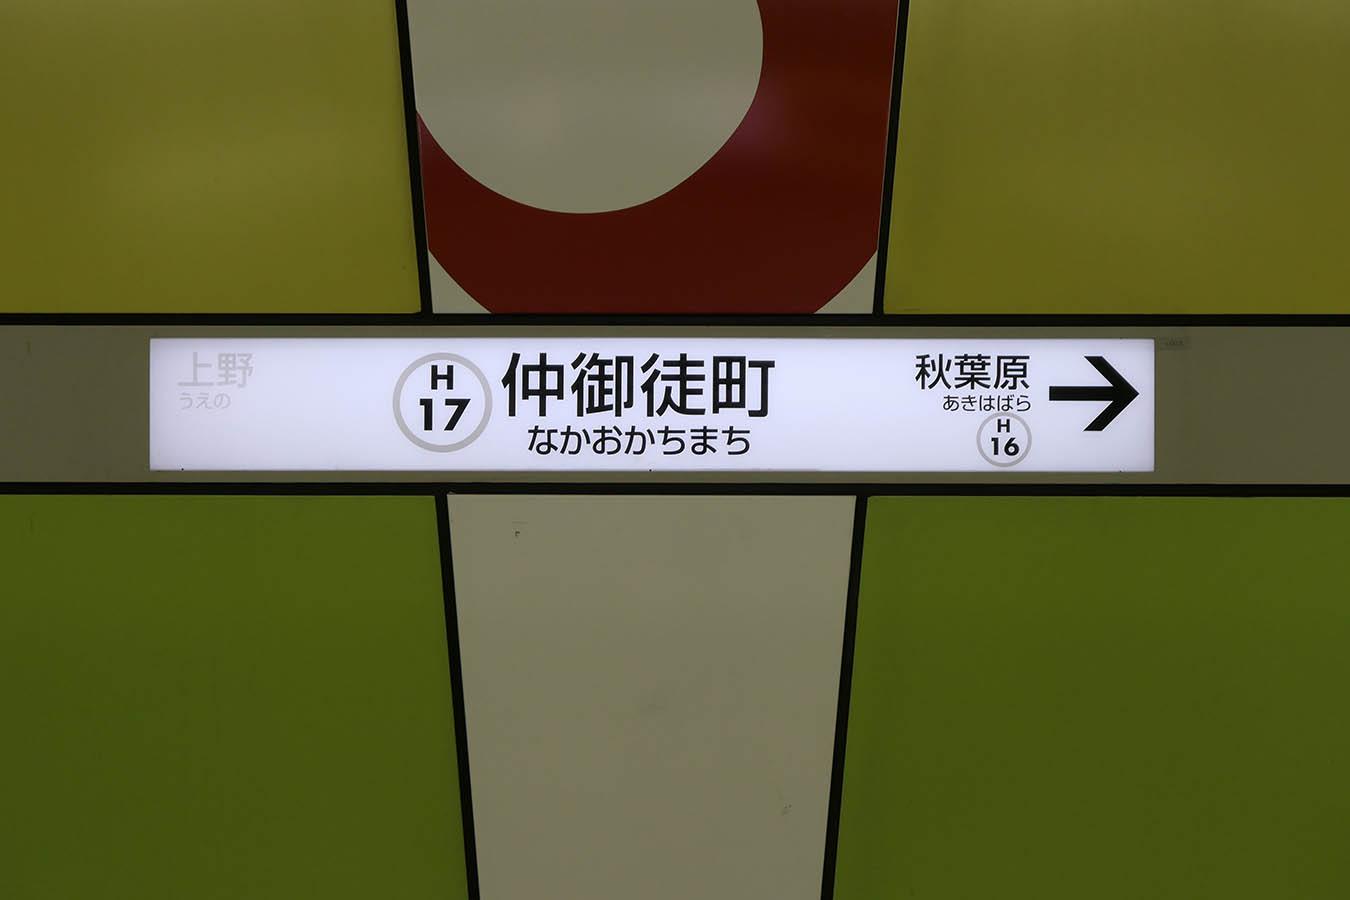 H17_photo05.jpg